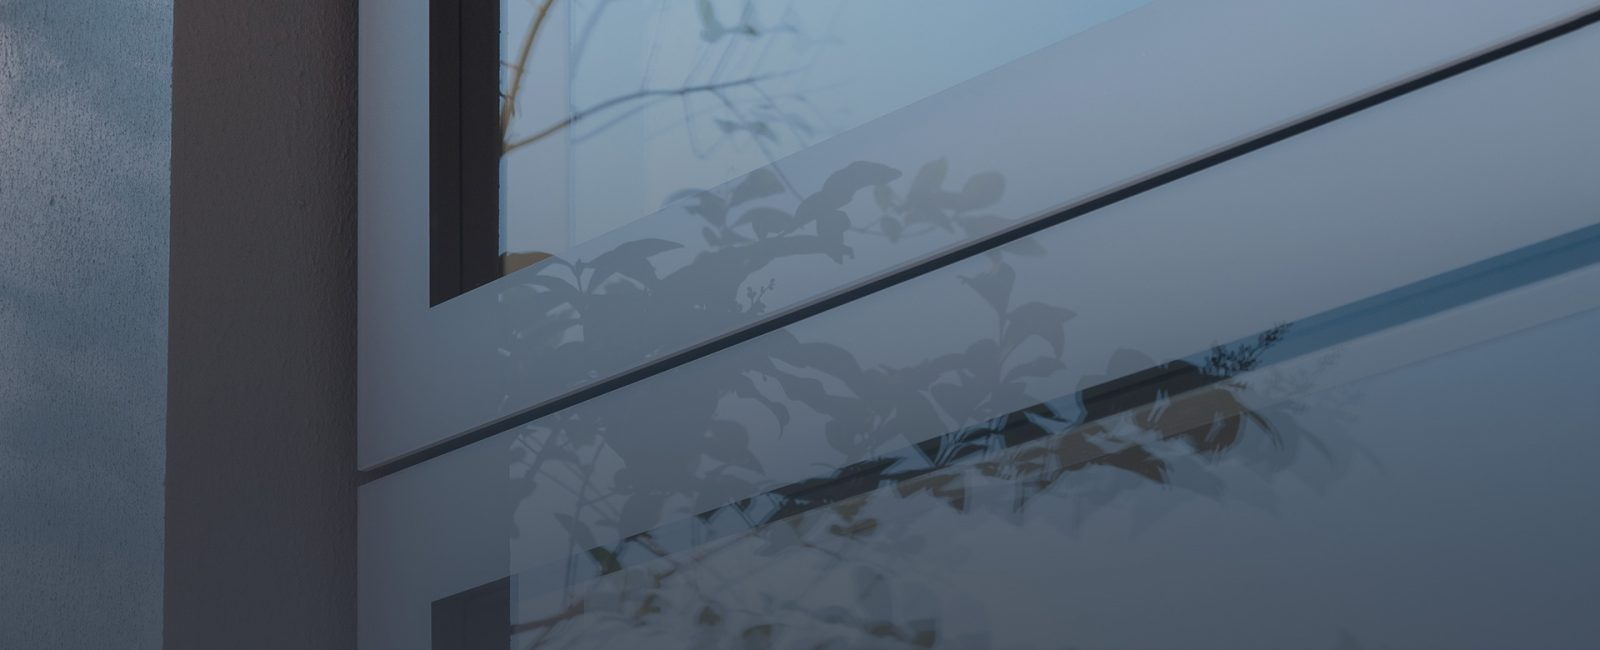 Apeer Lumi Windows